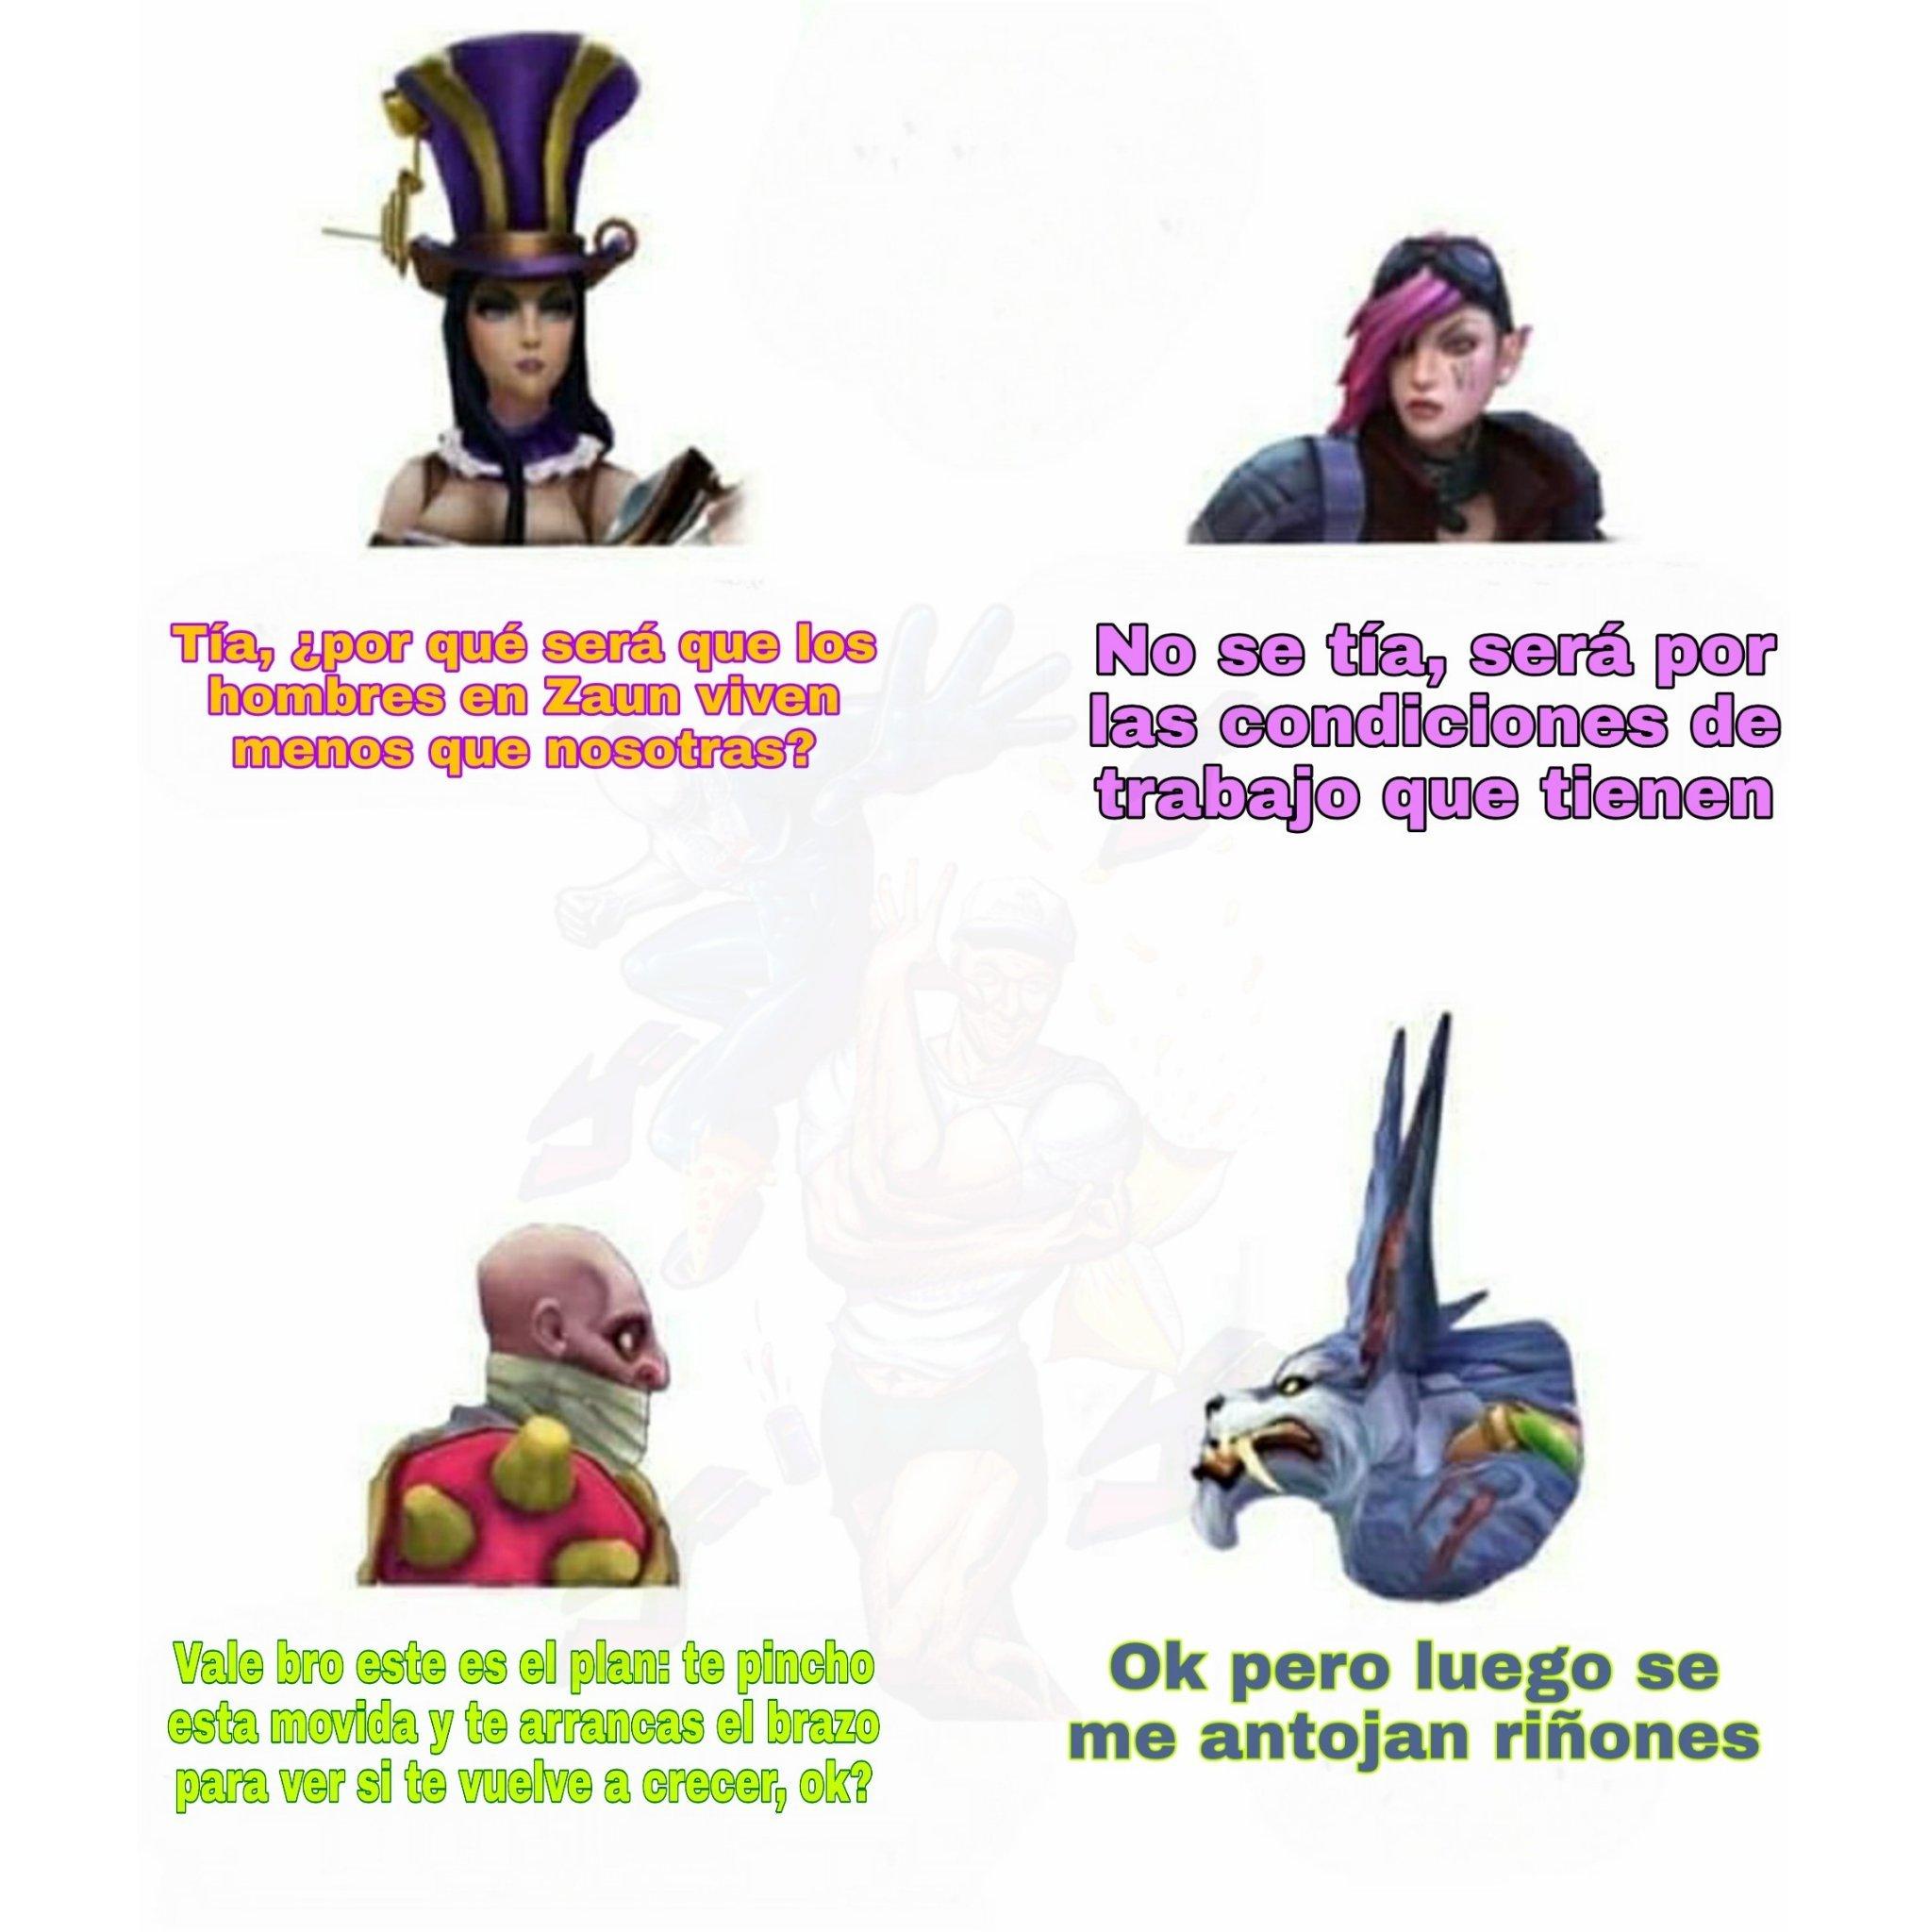 Meme del LoL